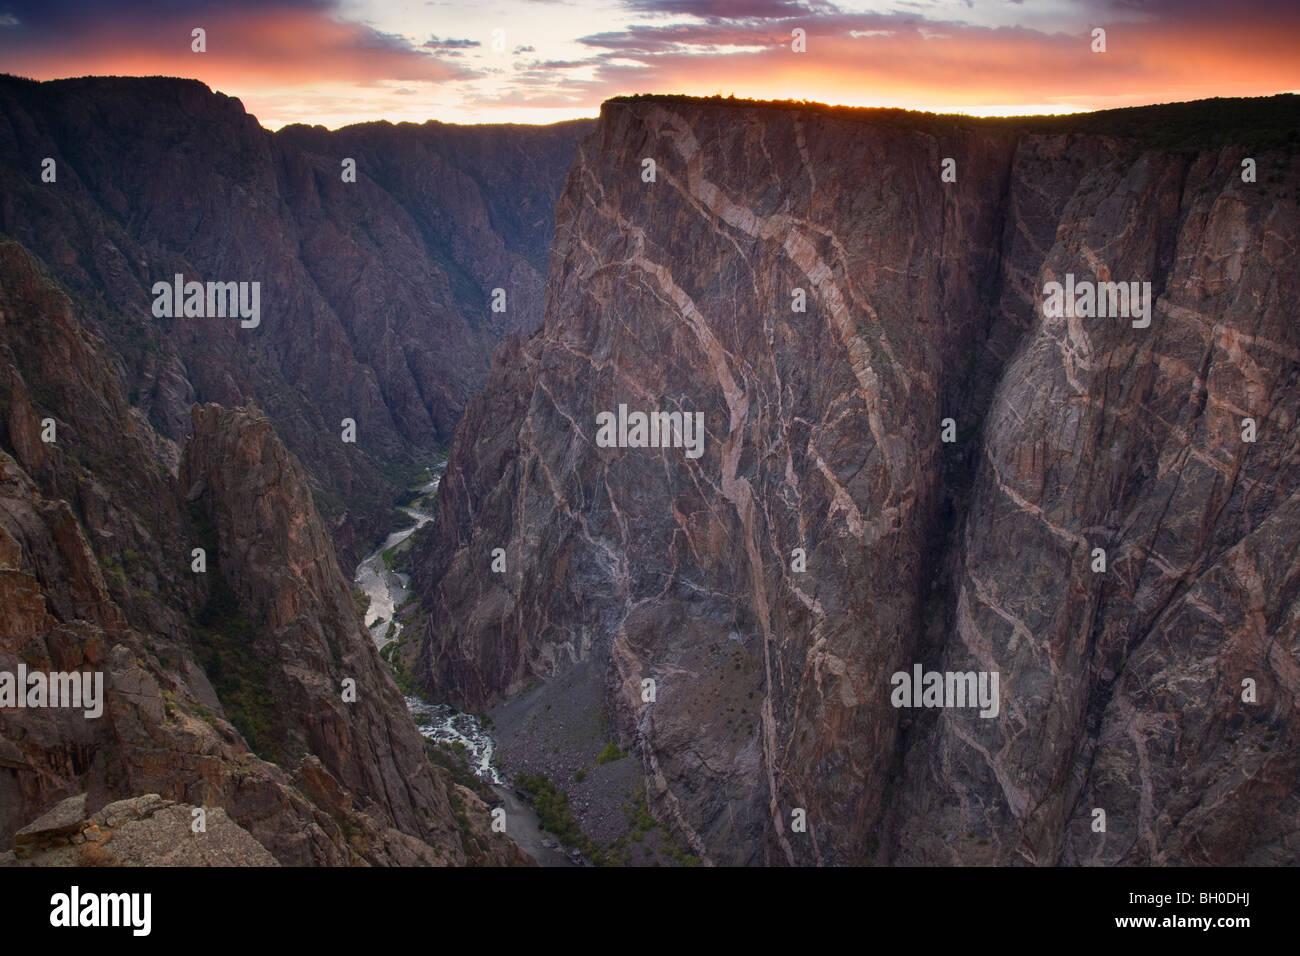 Mur peint, Parc National Black Canyon of the Gunnison, Colorado. Photo Stock